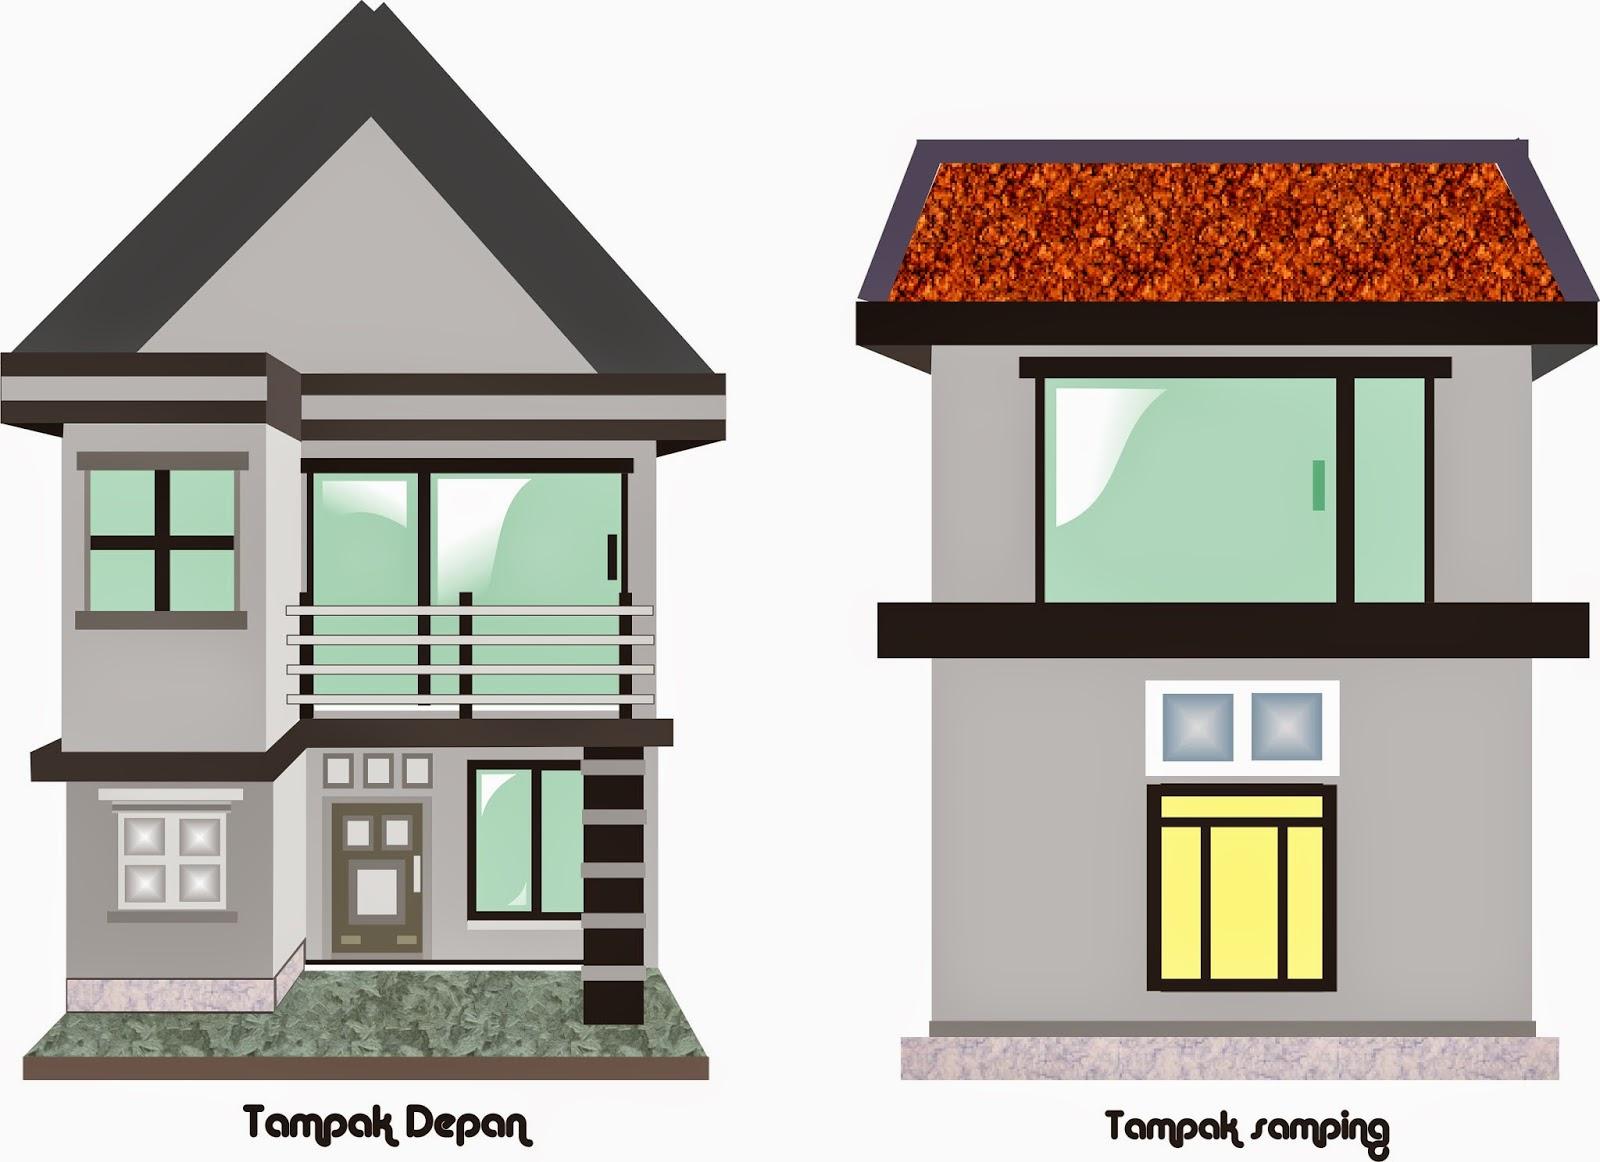 Gambar Template Coreldraw Prabotan Rumah Tangga Eio Arts